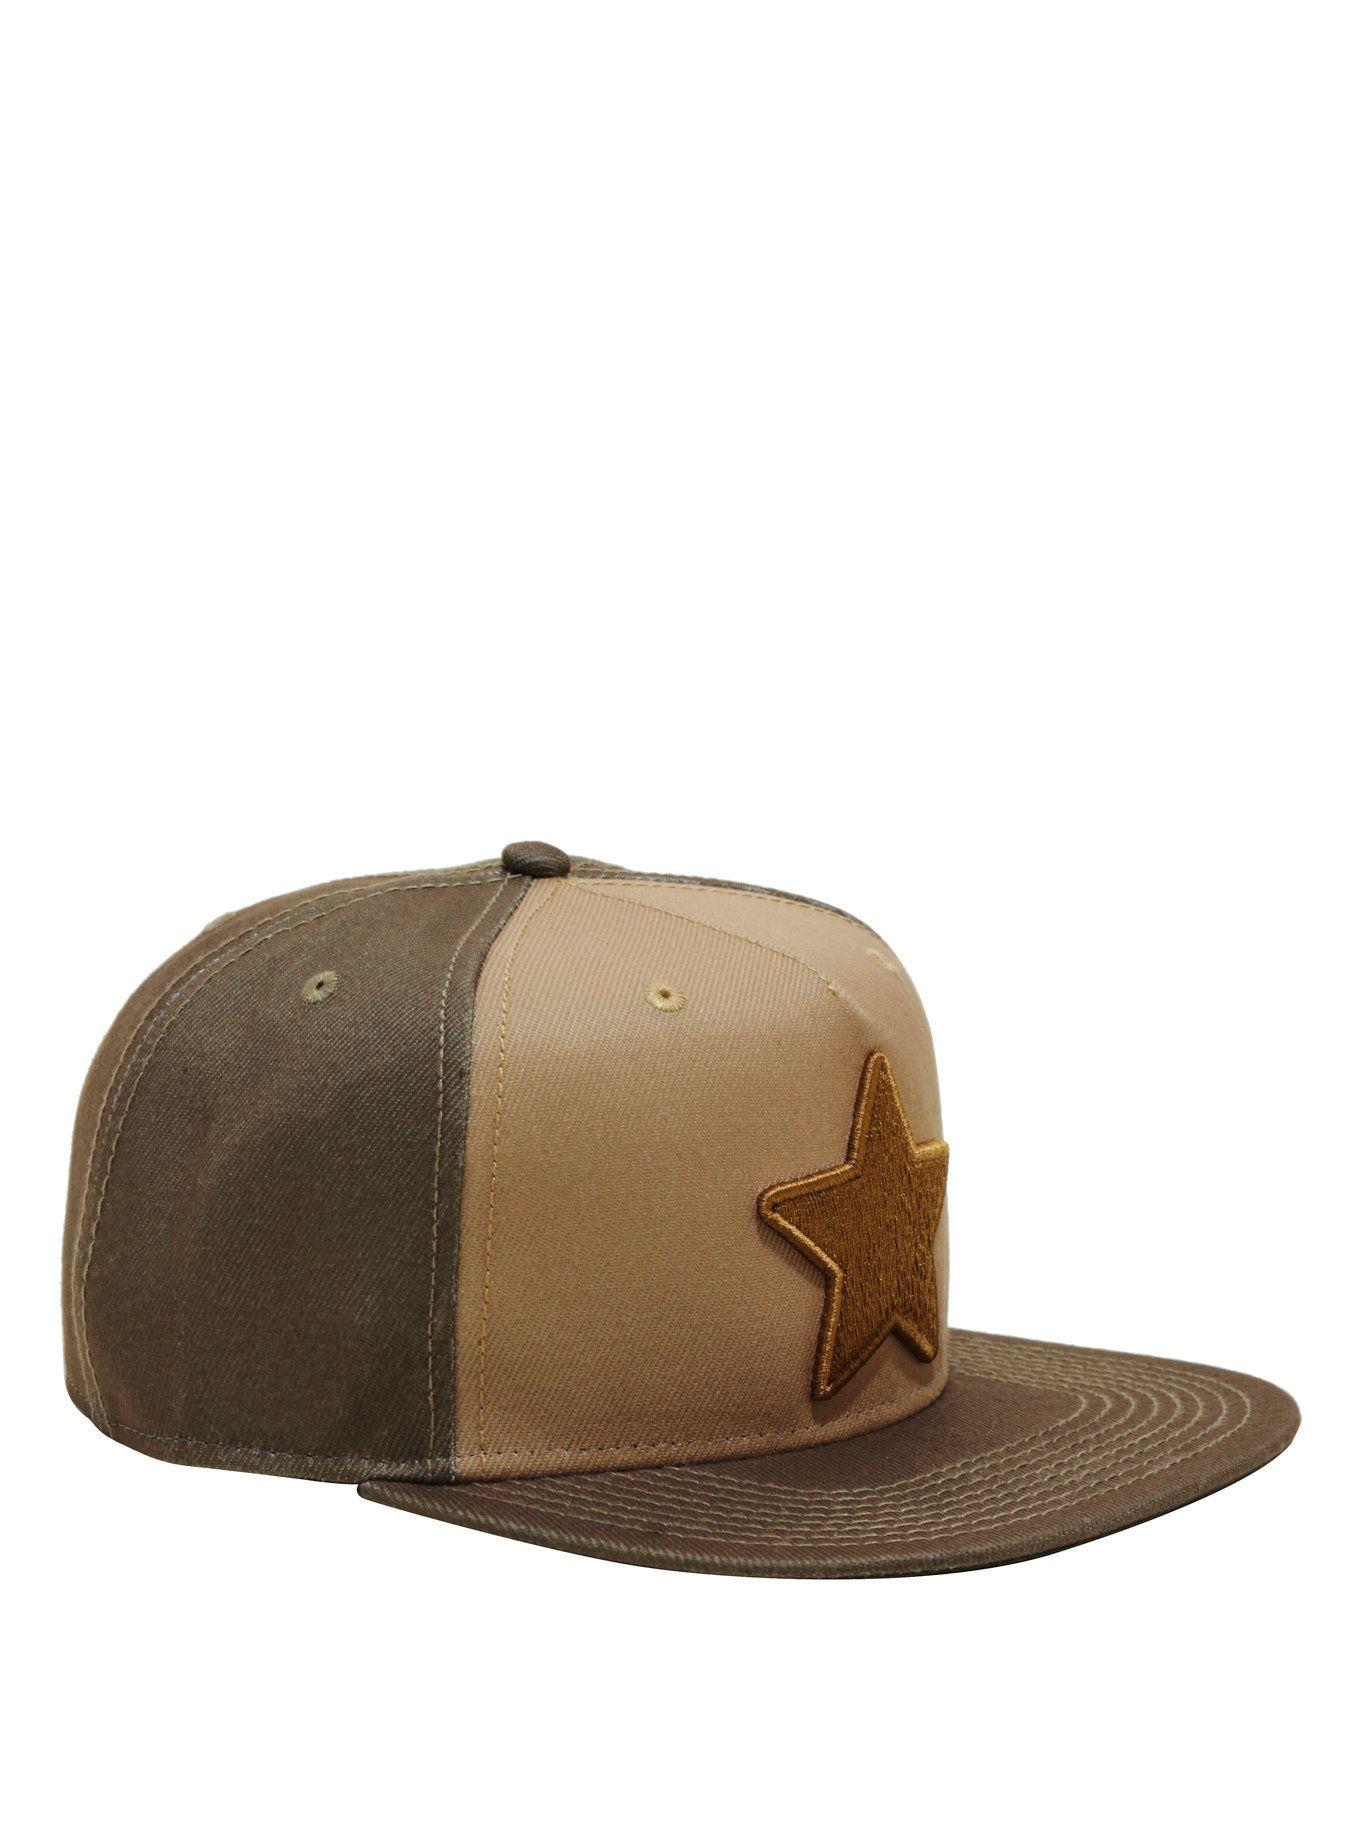 best loved 3f040 0e4f3 Disney Gravity Falls Dipper Pines Star Cosplay Snapback Hat